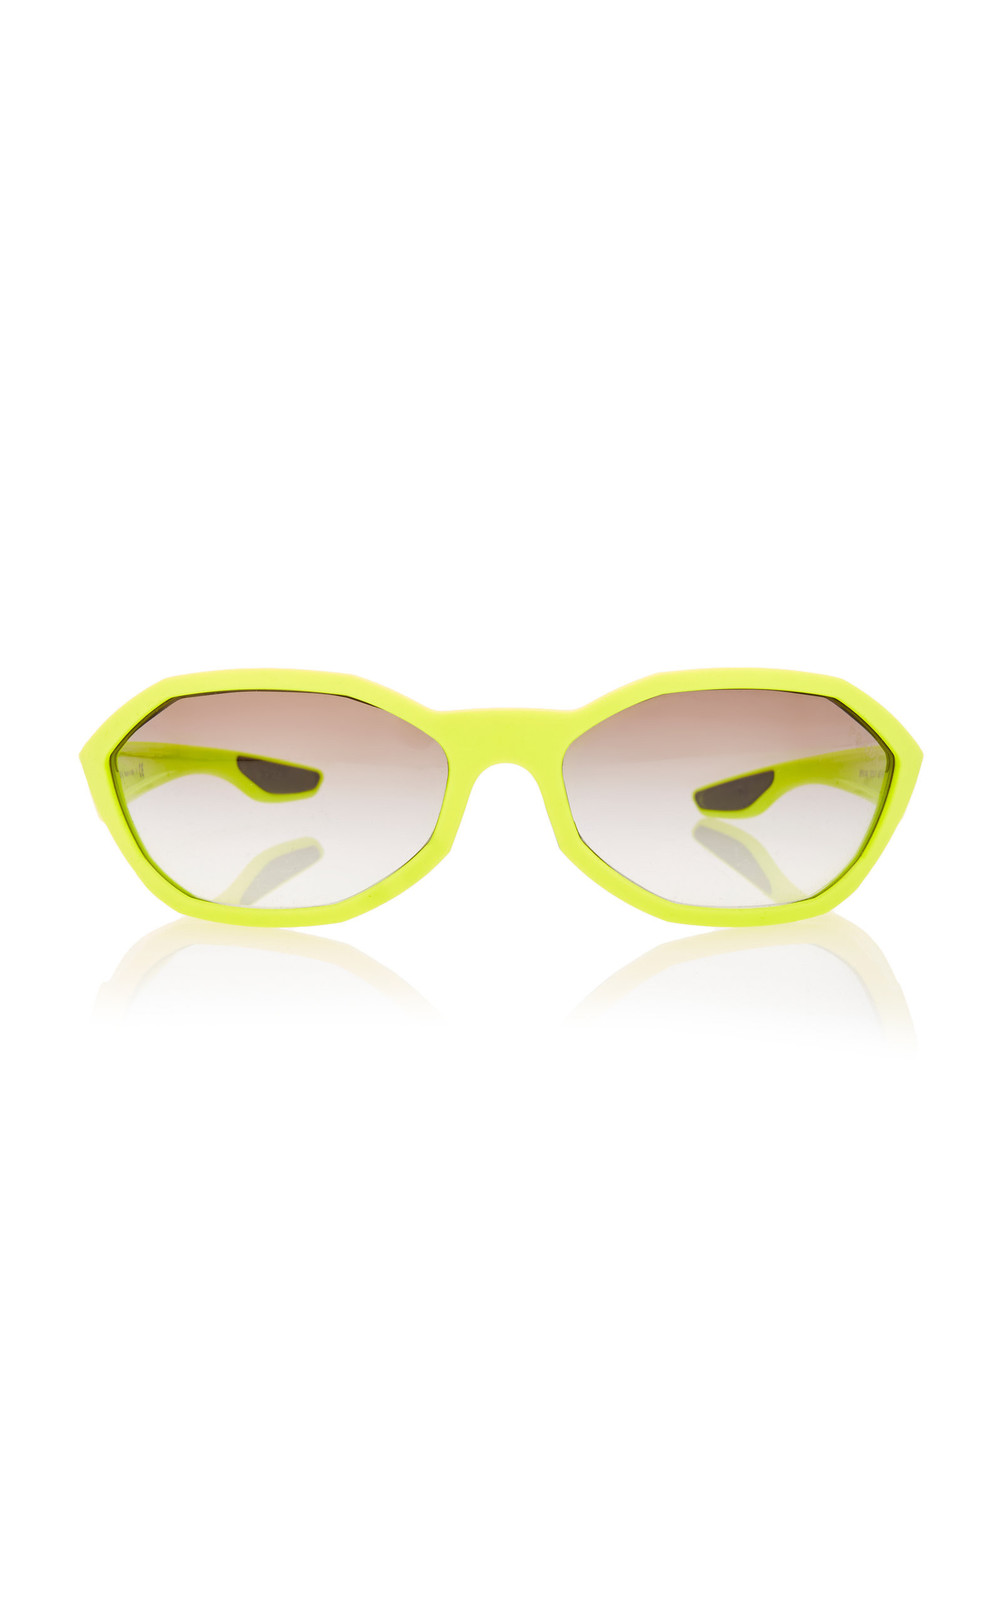 Prada Linea Rossa Hexagon-Frame Acetate Sunglasses in yellow